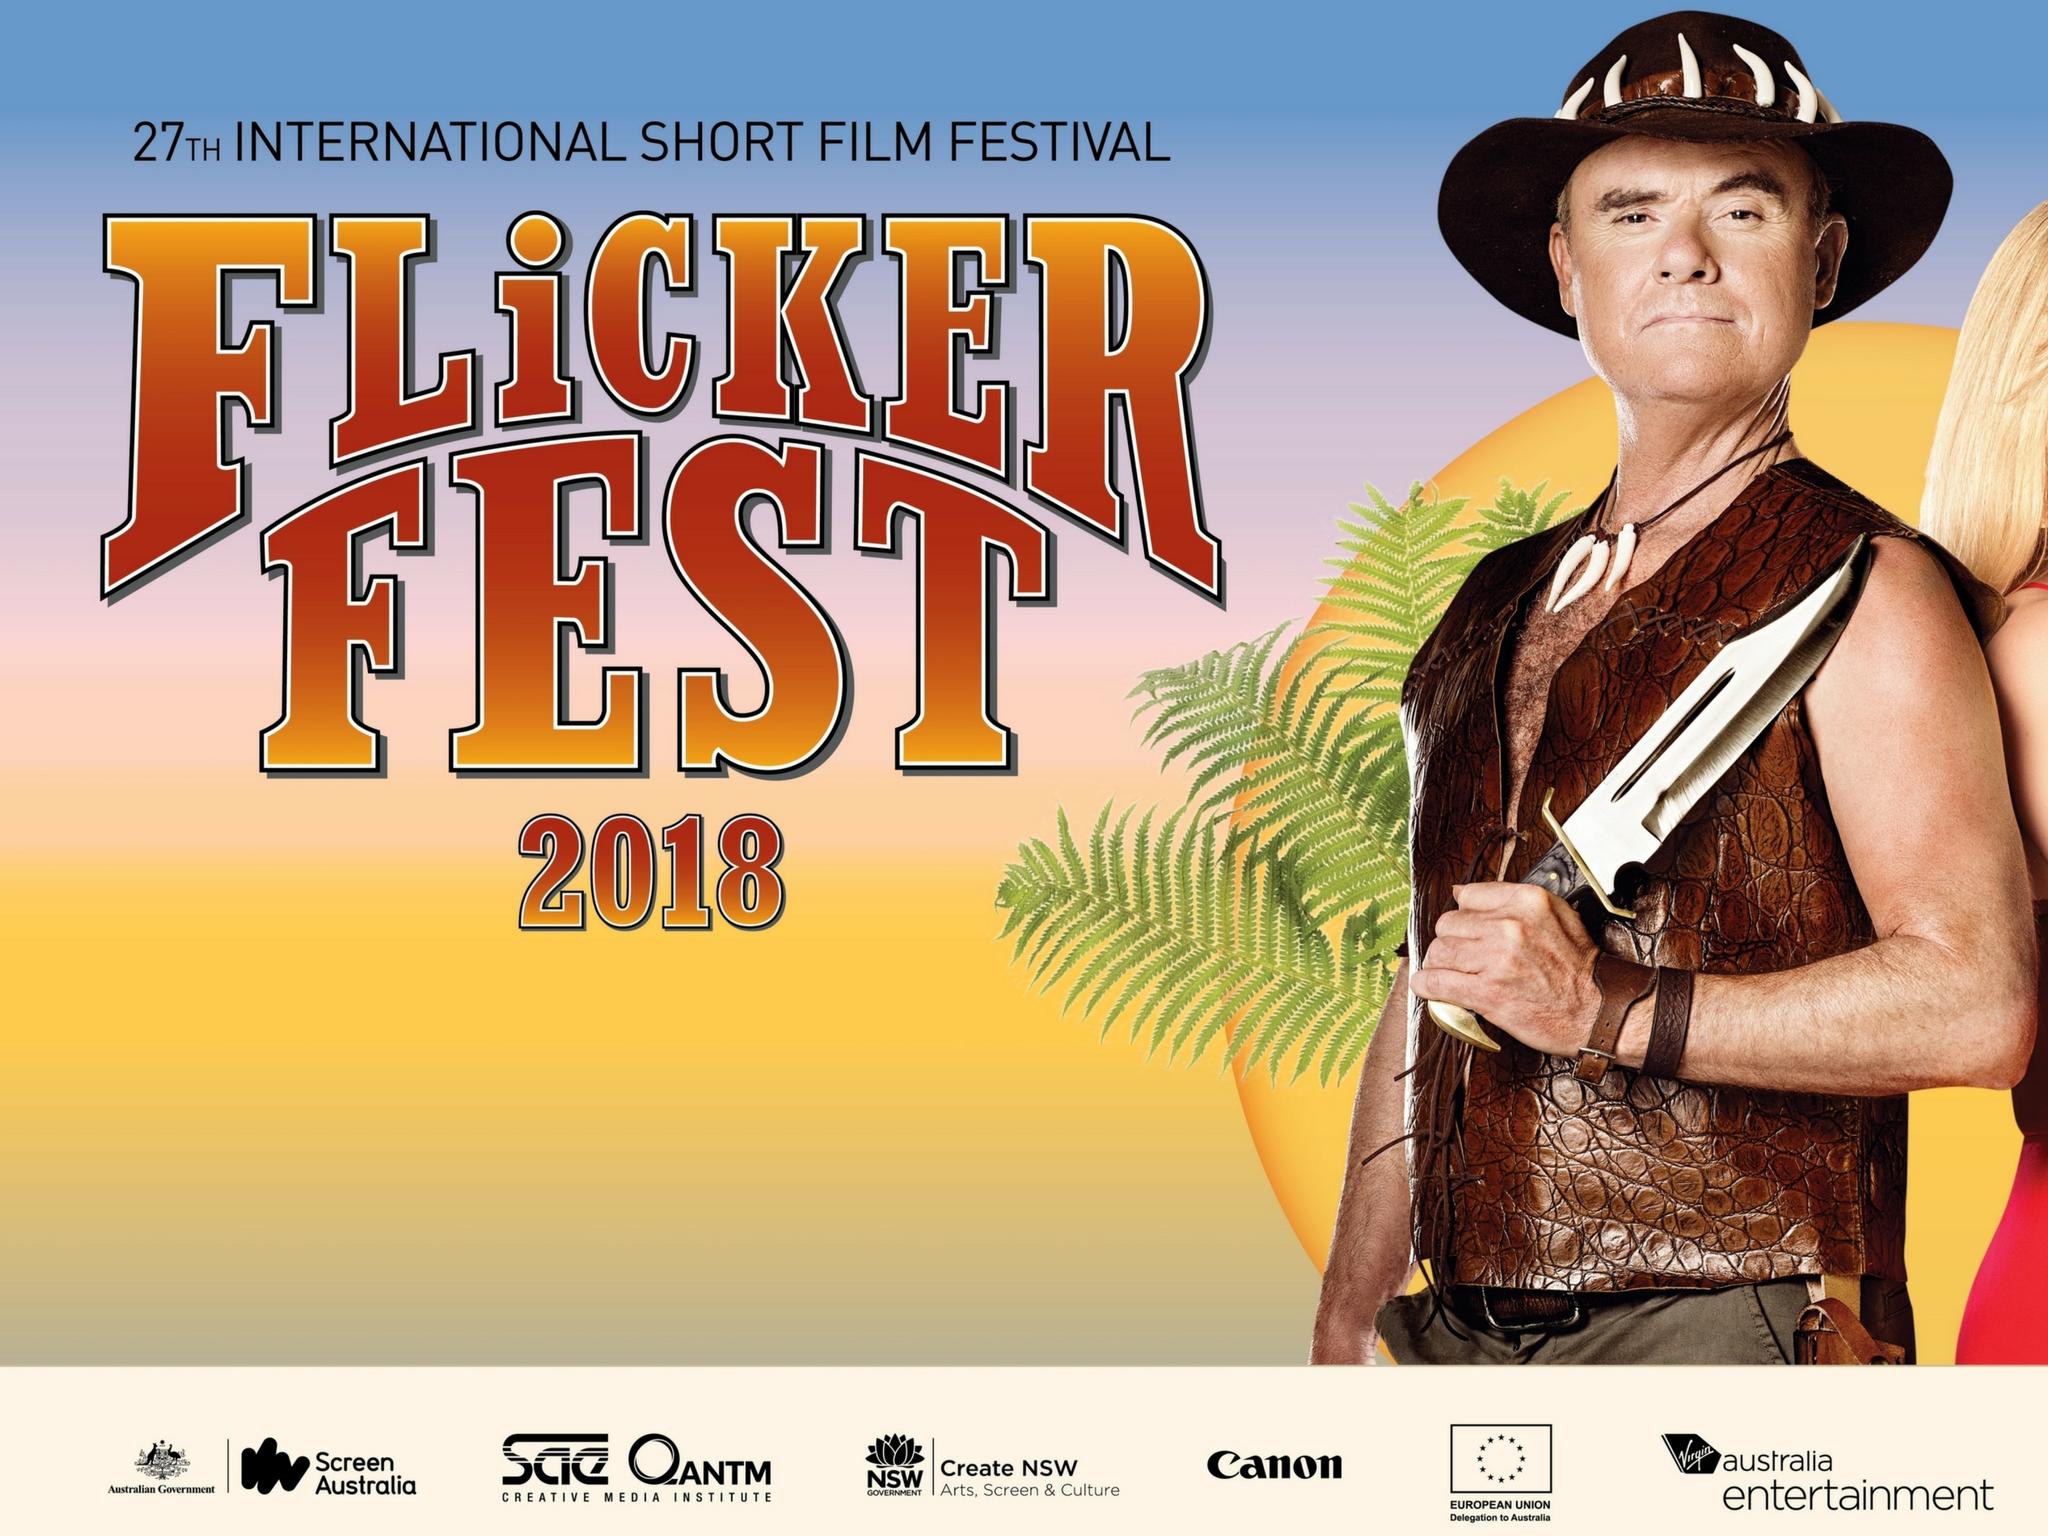 FLiCKERFEST in the Hunter Valley